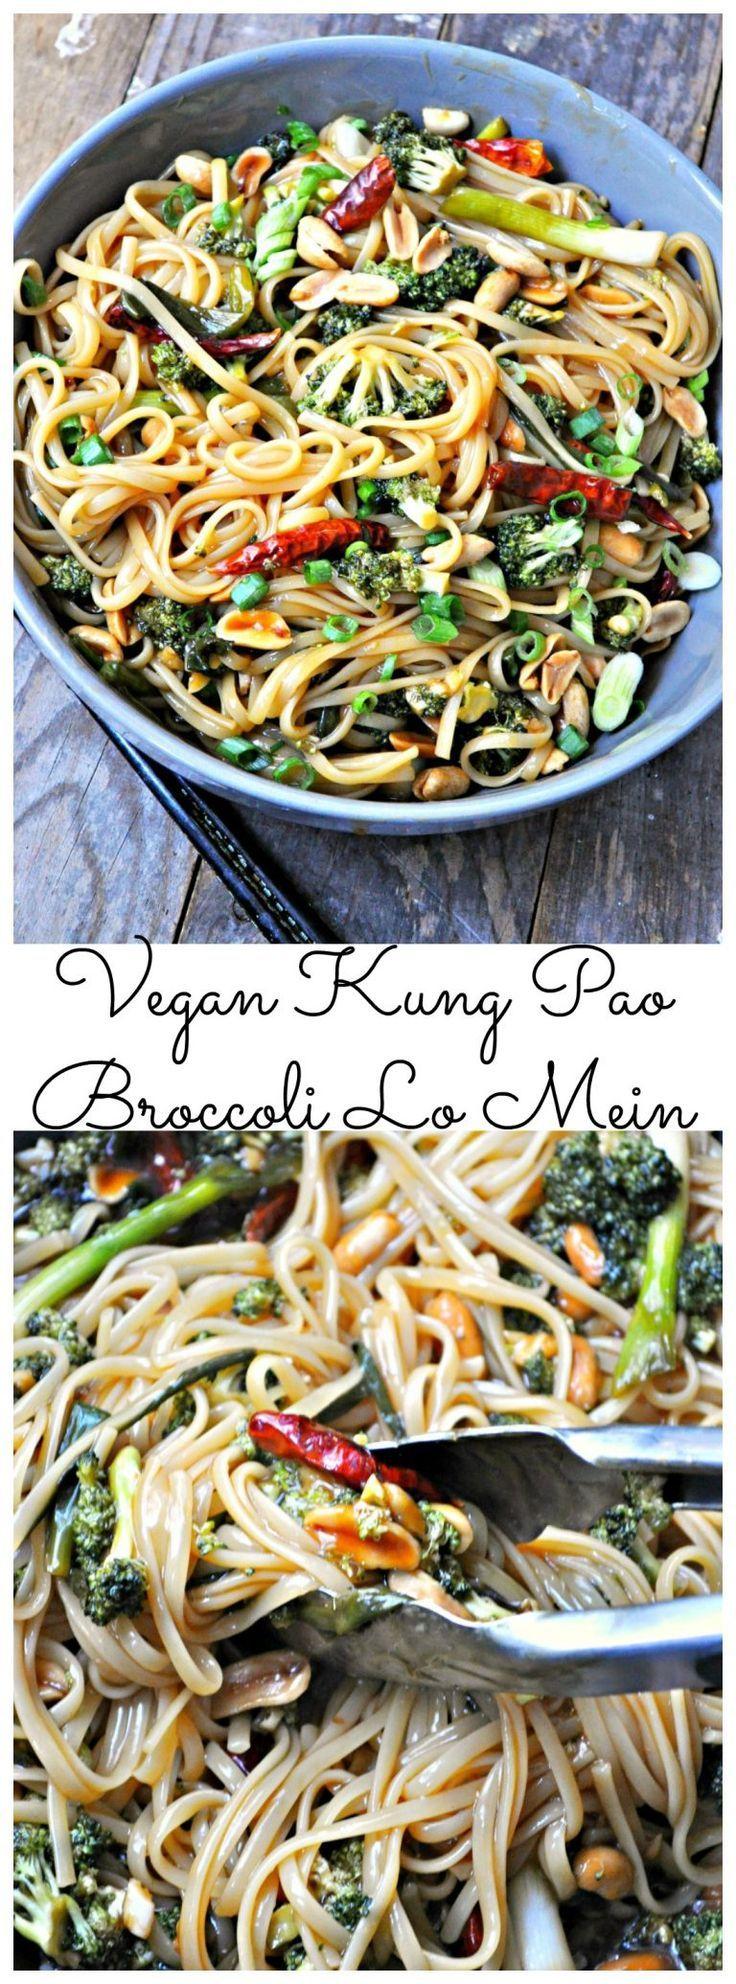 Vegan Kung Pao Broccoli Lo Mein #vegetariandish